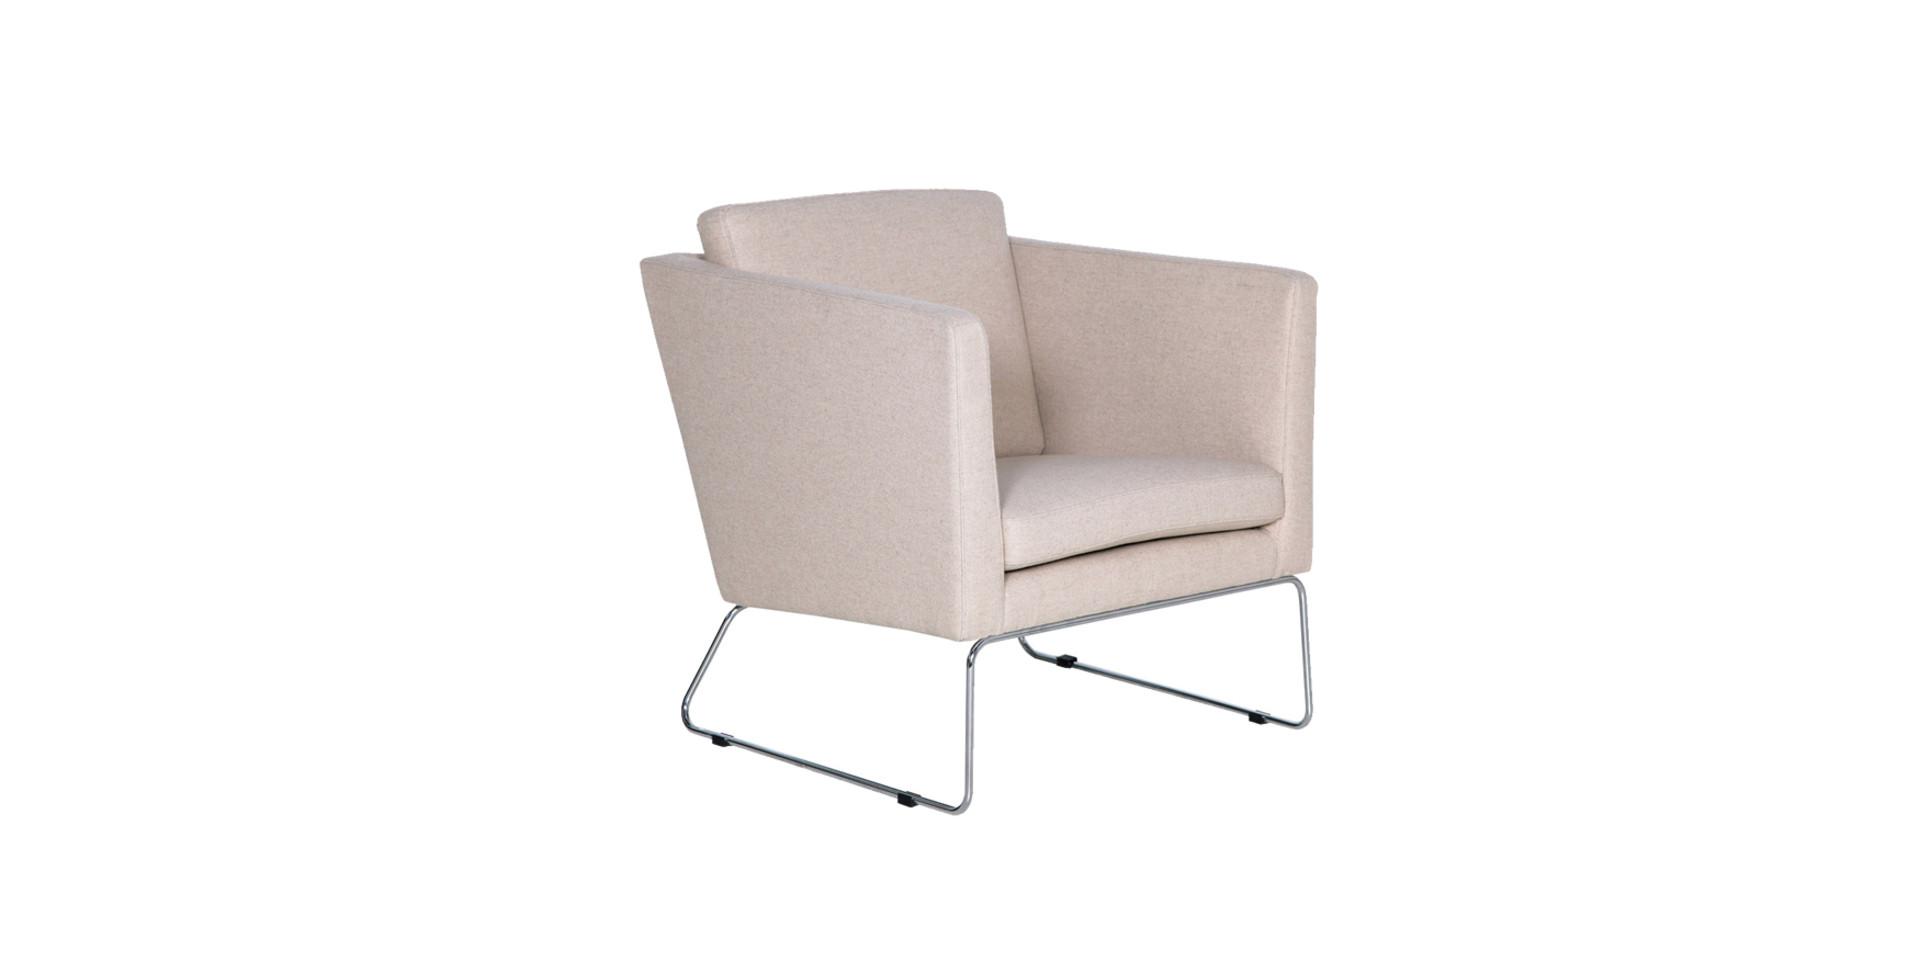 sits-clark-fauteuil-armchair_panno1037_oatmeal_marl_2